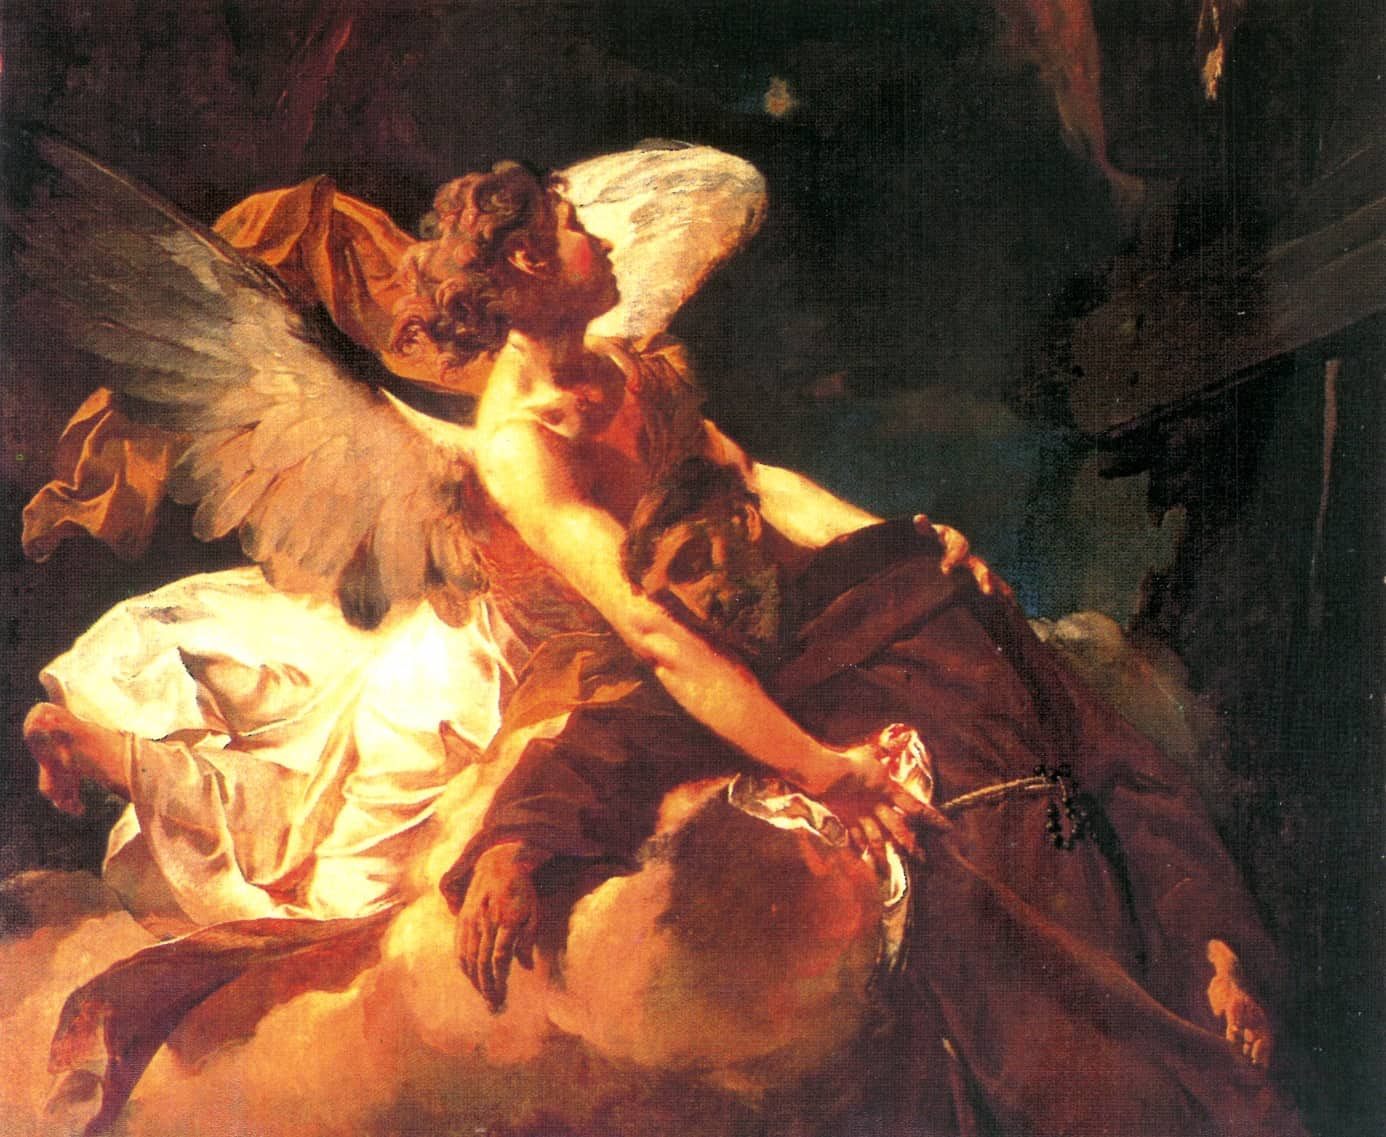 177-marinusjanmarijs.com-angel